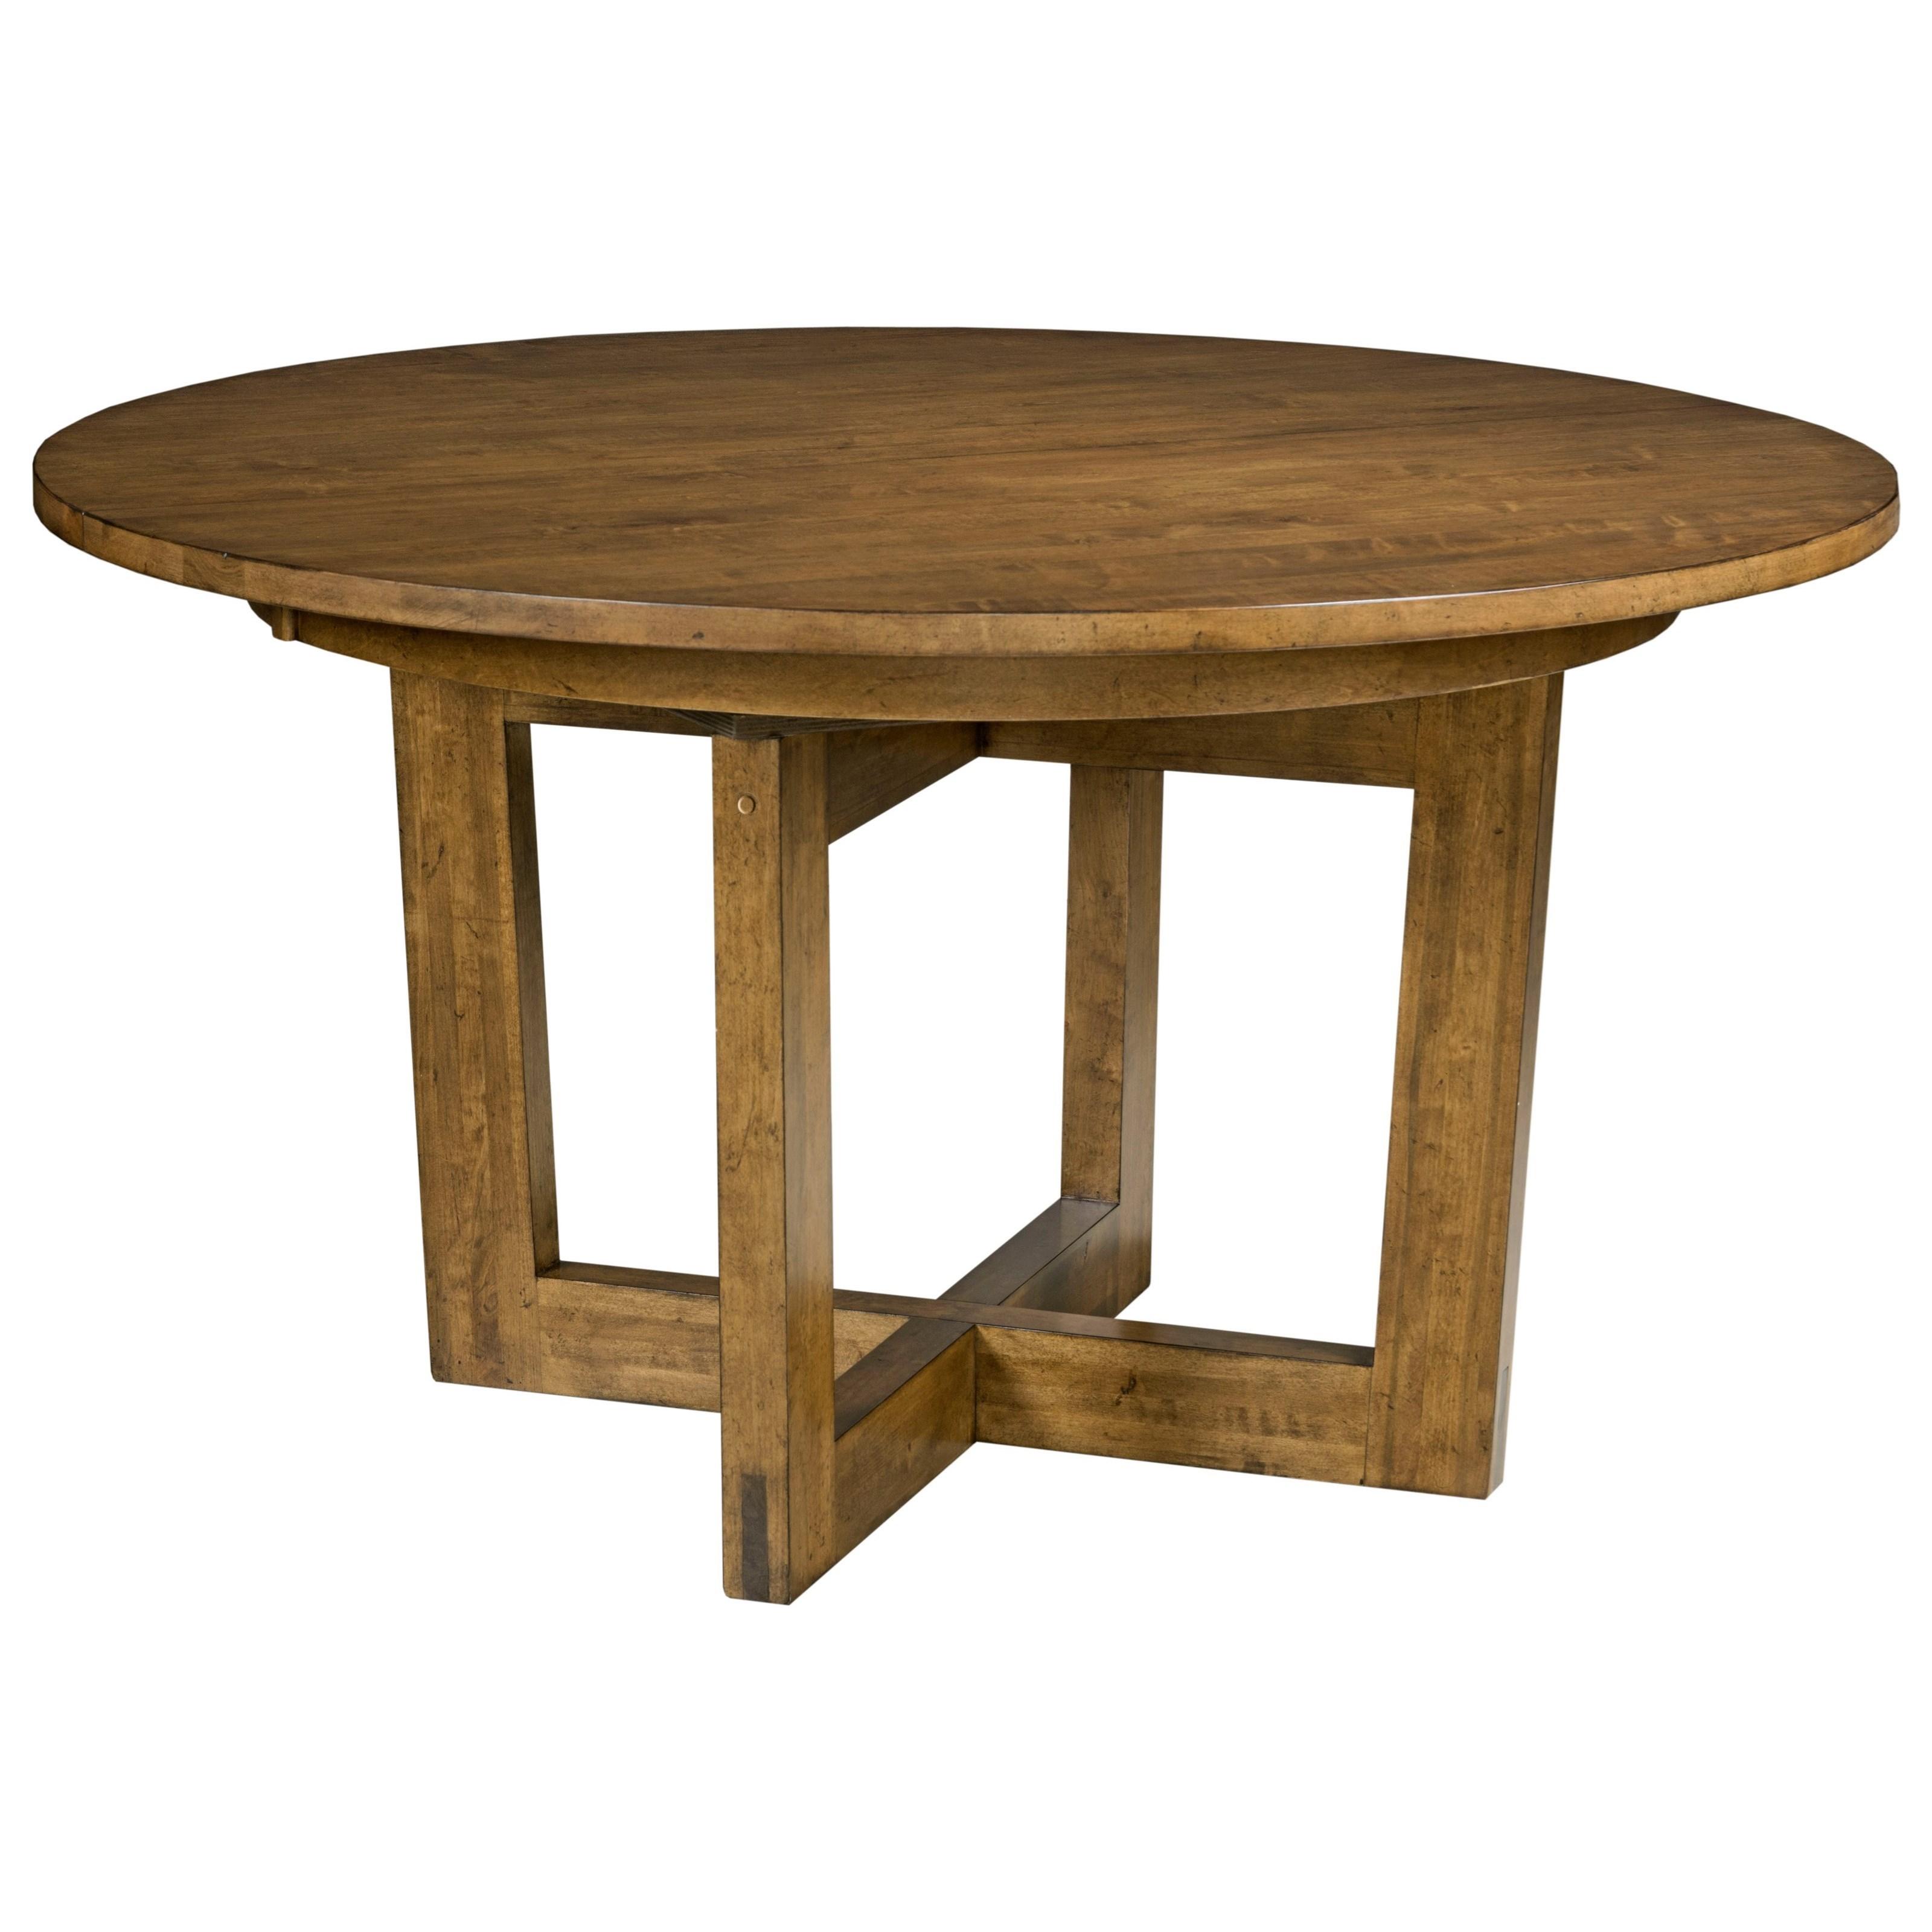 Kincaid Furniture Traverse Blacksmith Modern Craftsman 54  : products2Fkincaidfurniture2Fcolor2Ftraverse660 701 b1 from www.hudsonsfurniture.com size 3200 x 3200 jpeg 684kB